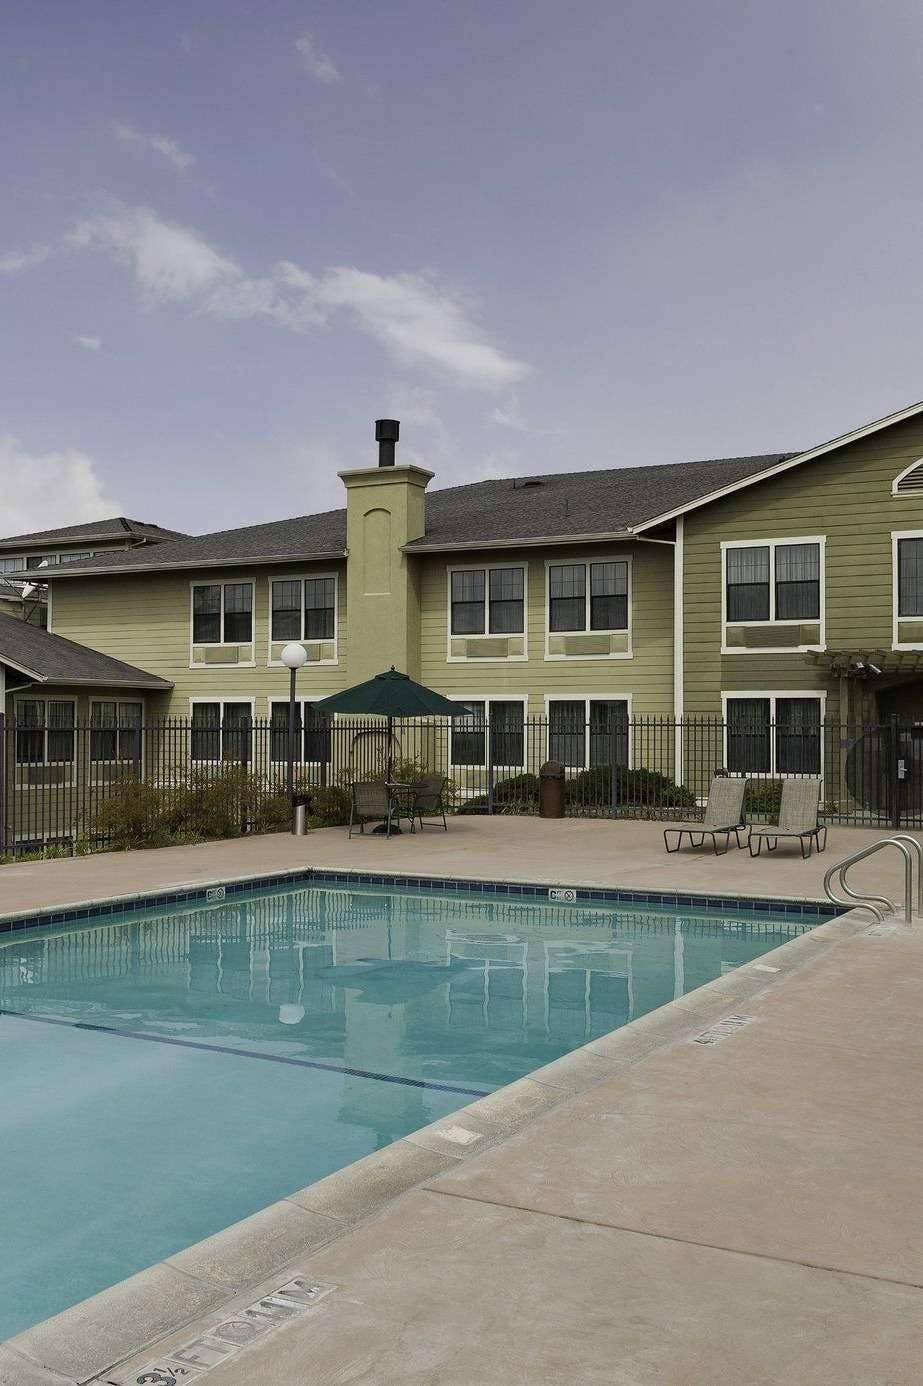 Fairfield Inn & Suites Santa Rosa Sebastopol